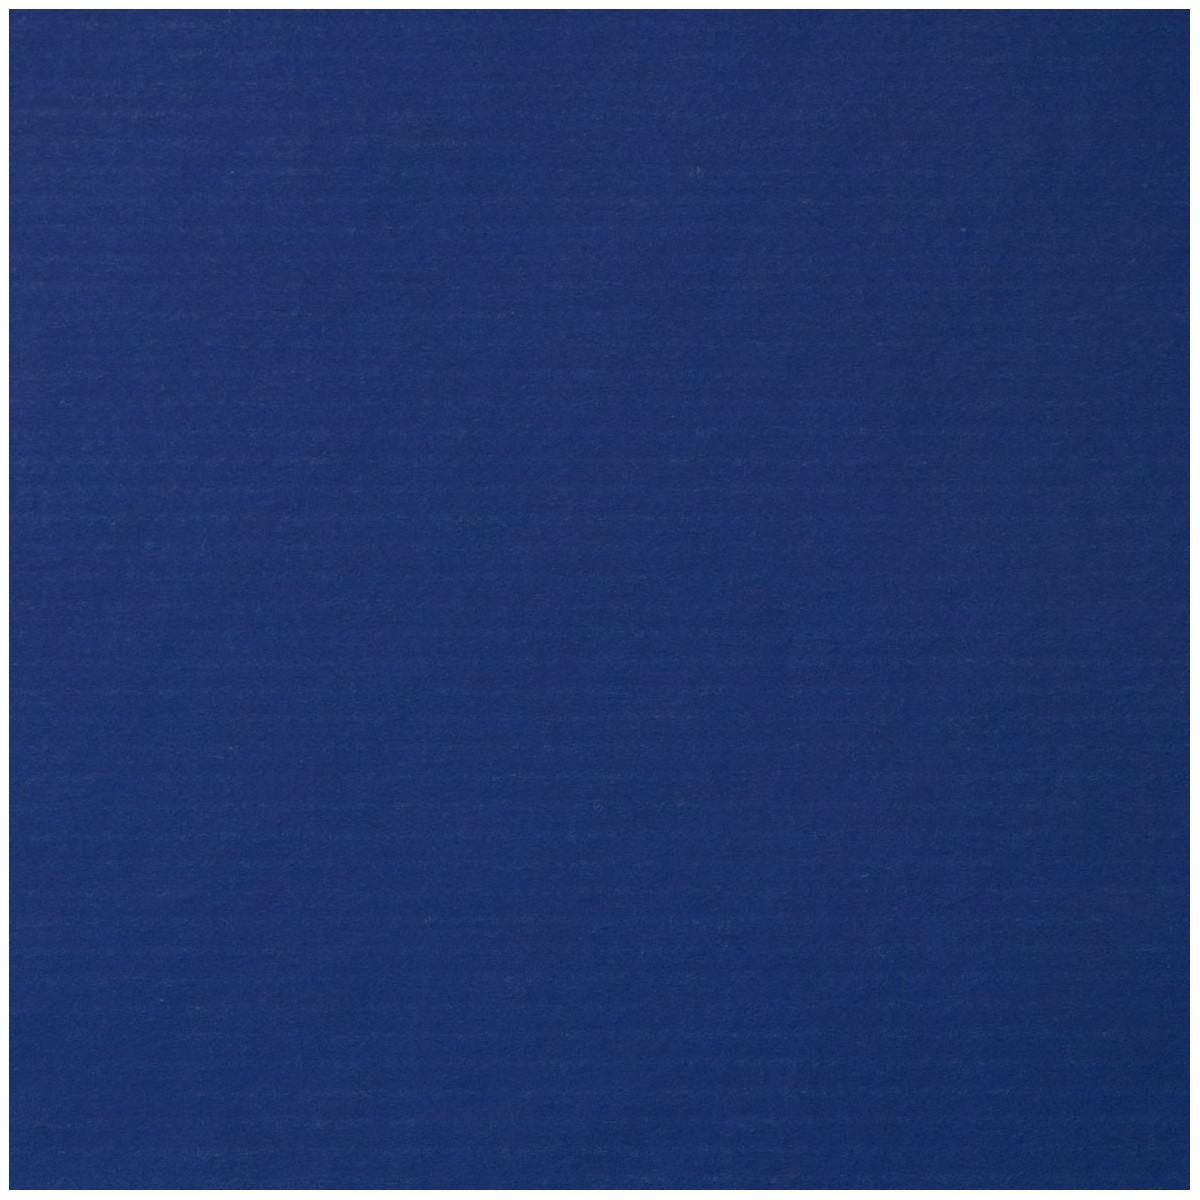 Carta Sealing Avana ECOBROWN Gr.60 Fogli Cm.70x100 Colori Tinta Unita (al Kg.) Blu